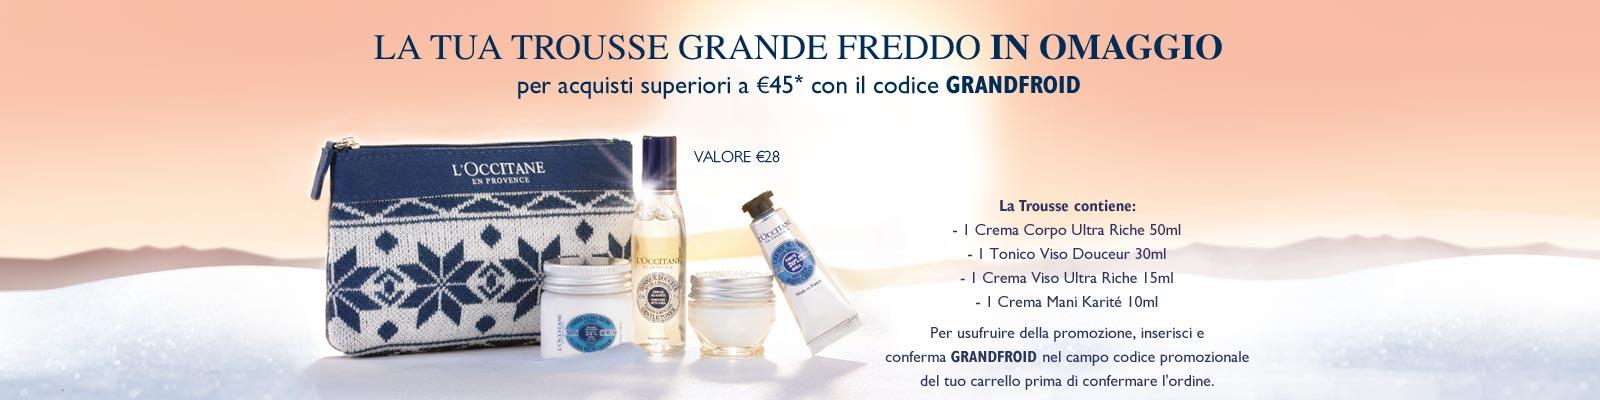 Offerta Grande Freddo - L'Occitane France